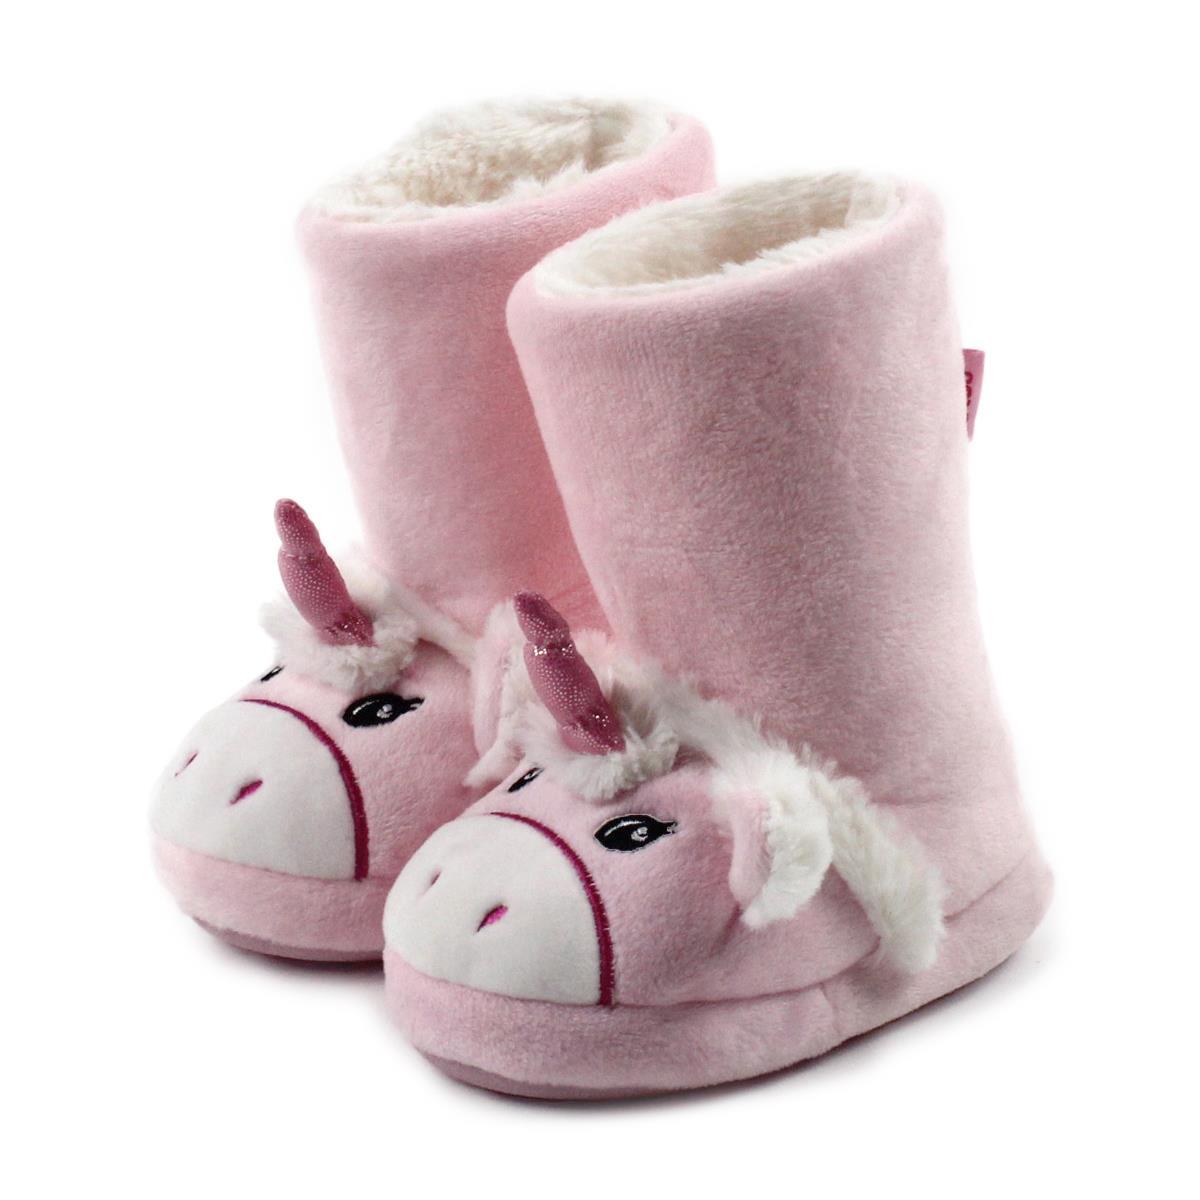 2102b213310 totes Girls Novelty Unicorn Booties